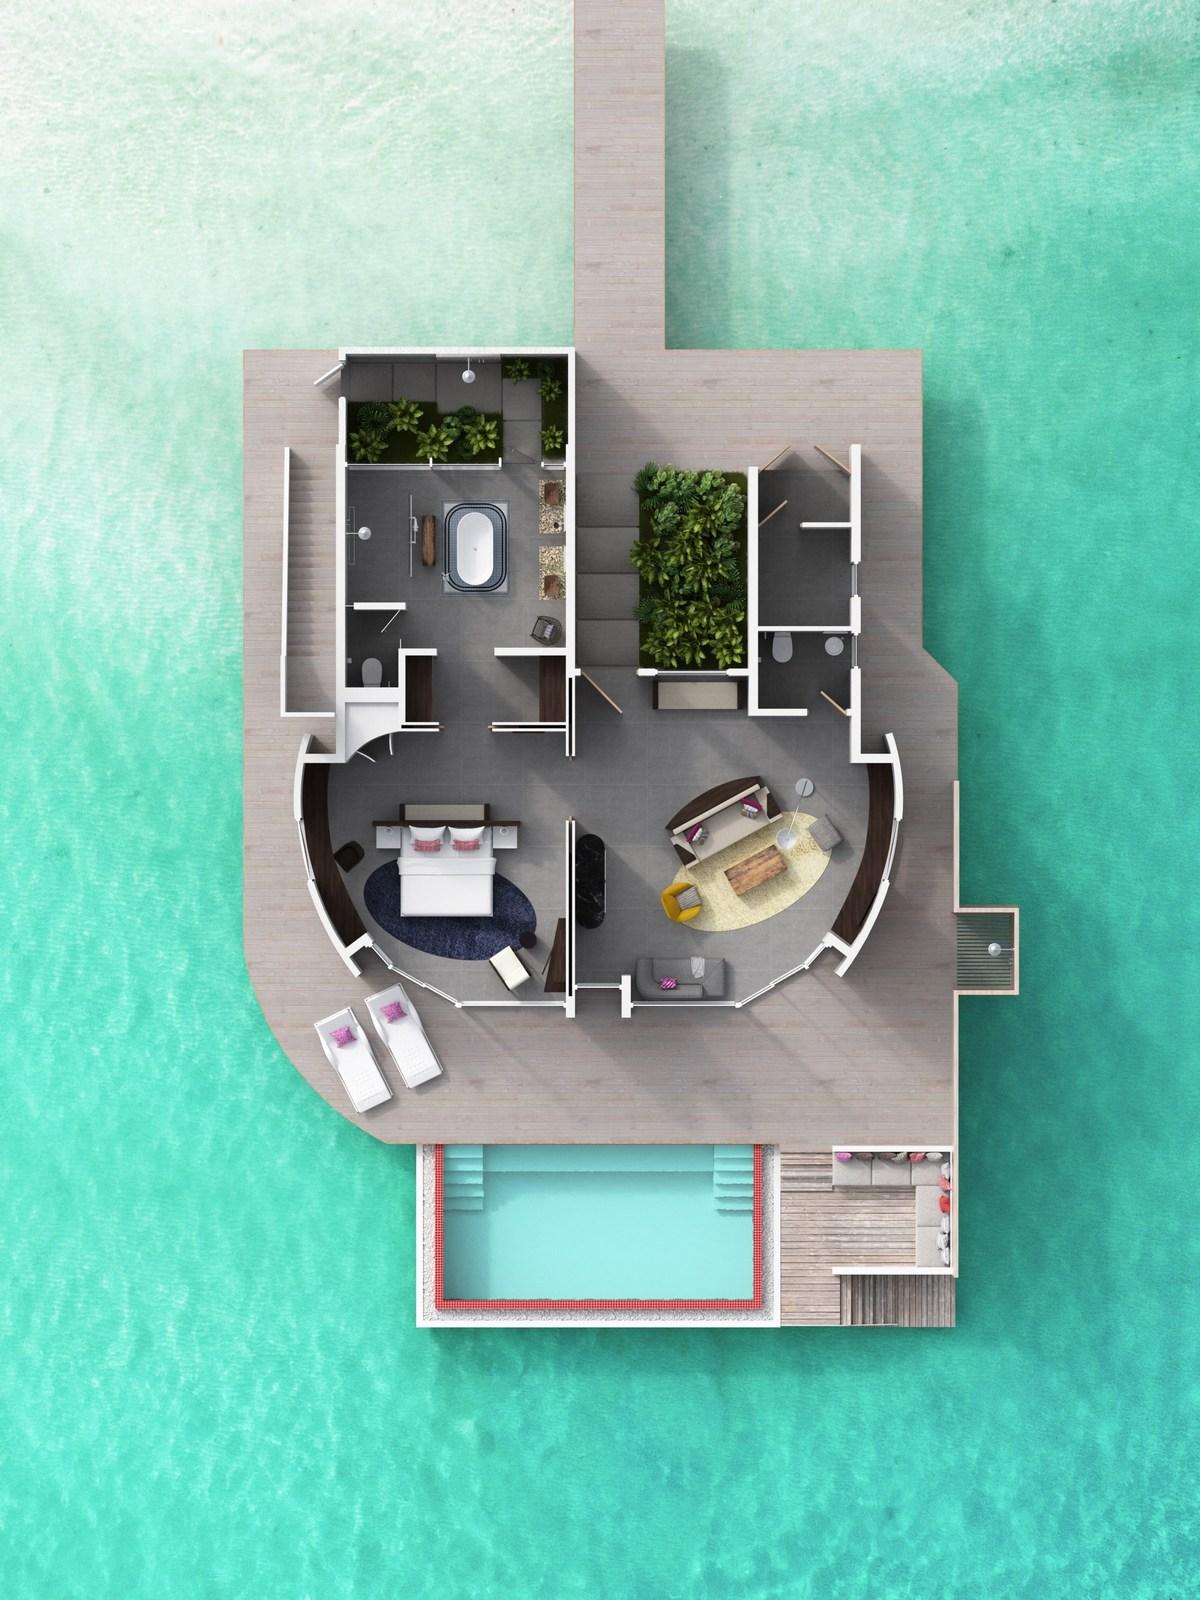 Мальдивы, отель LUX North Male Atoll, план-схема номера Water Villa with Pool